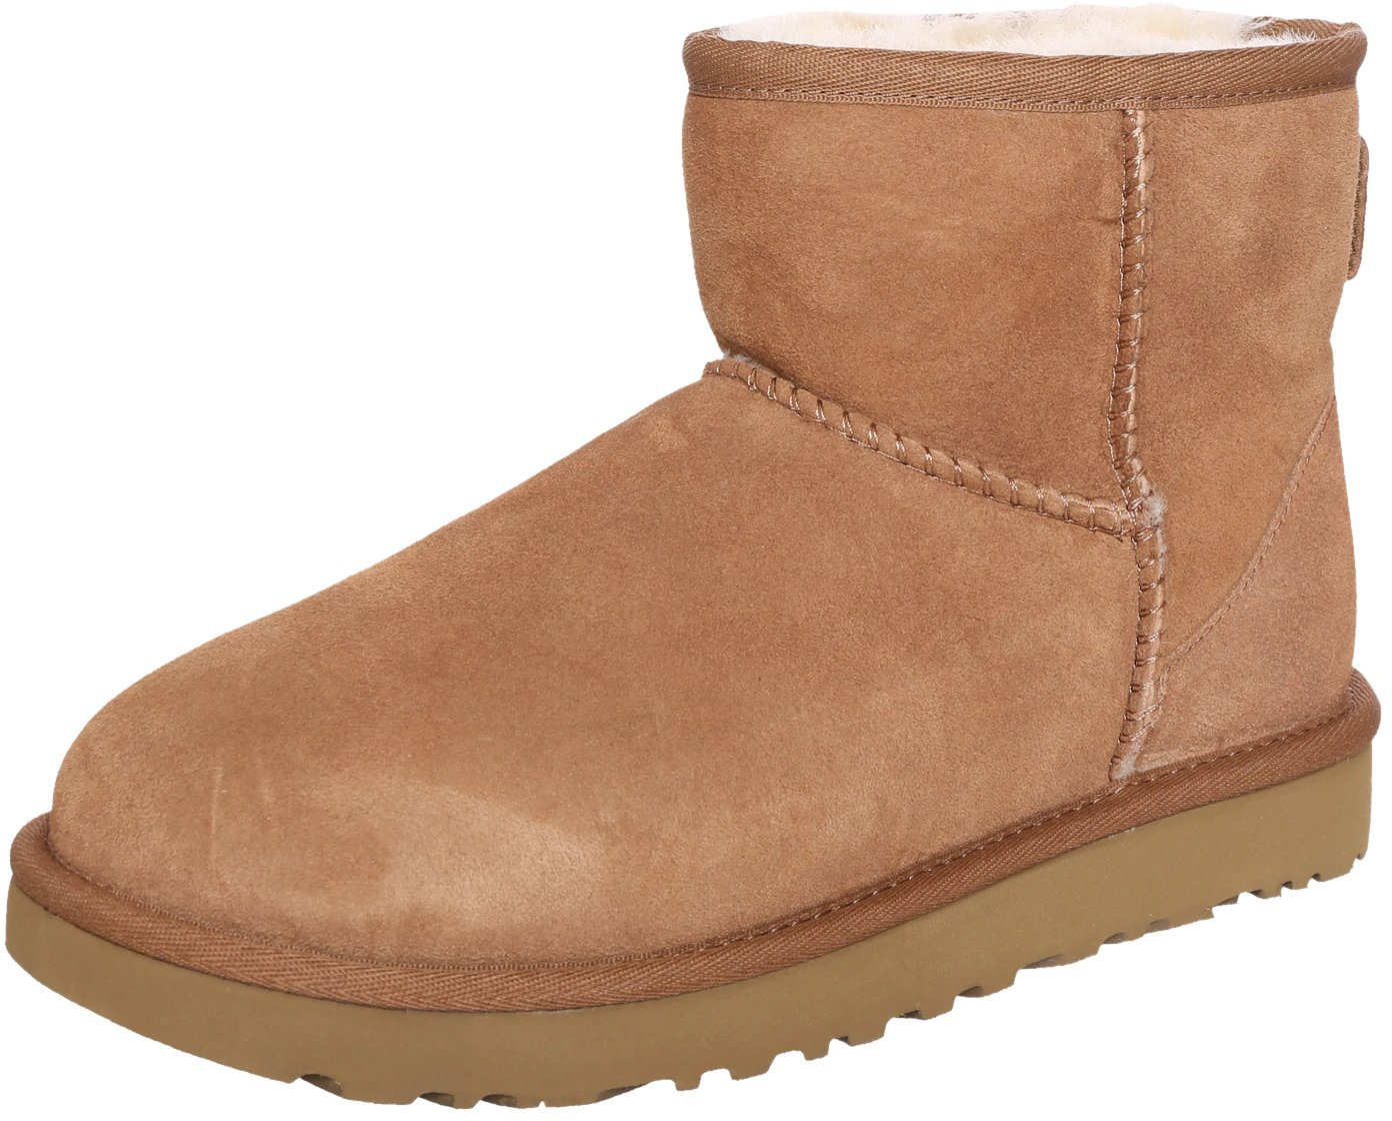 UGG BOOTS CLASSIC Mini, Damen, chestnut, Größe 40 EUR 34